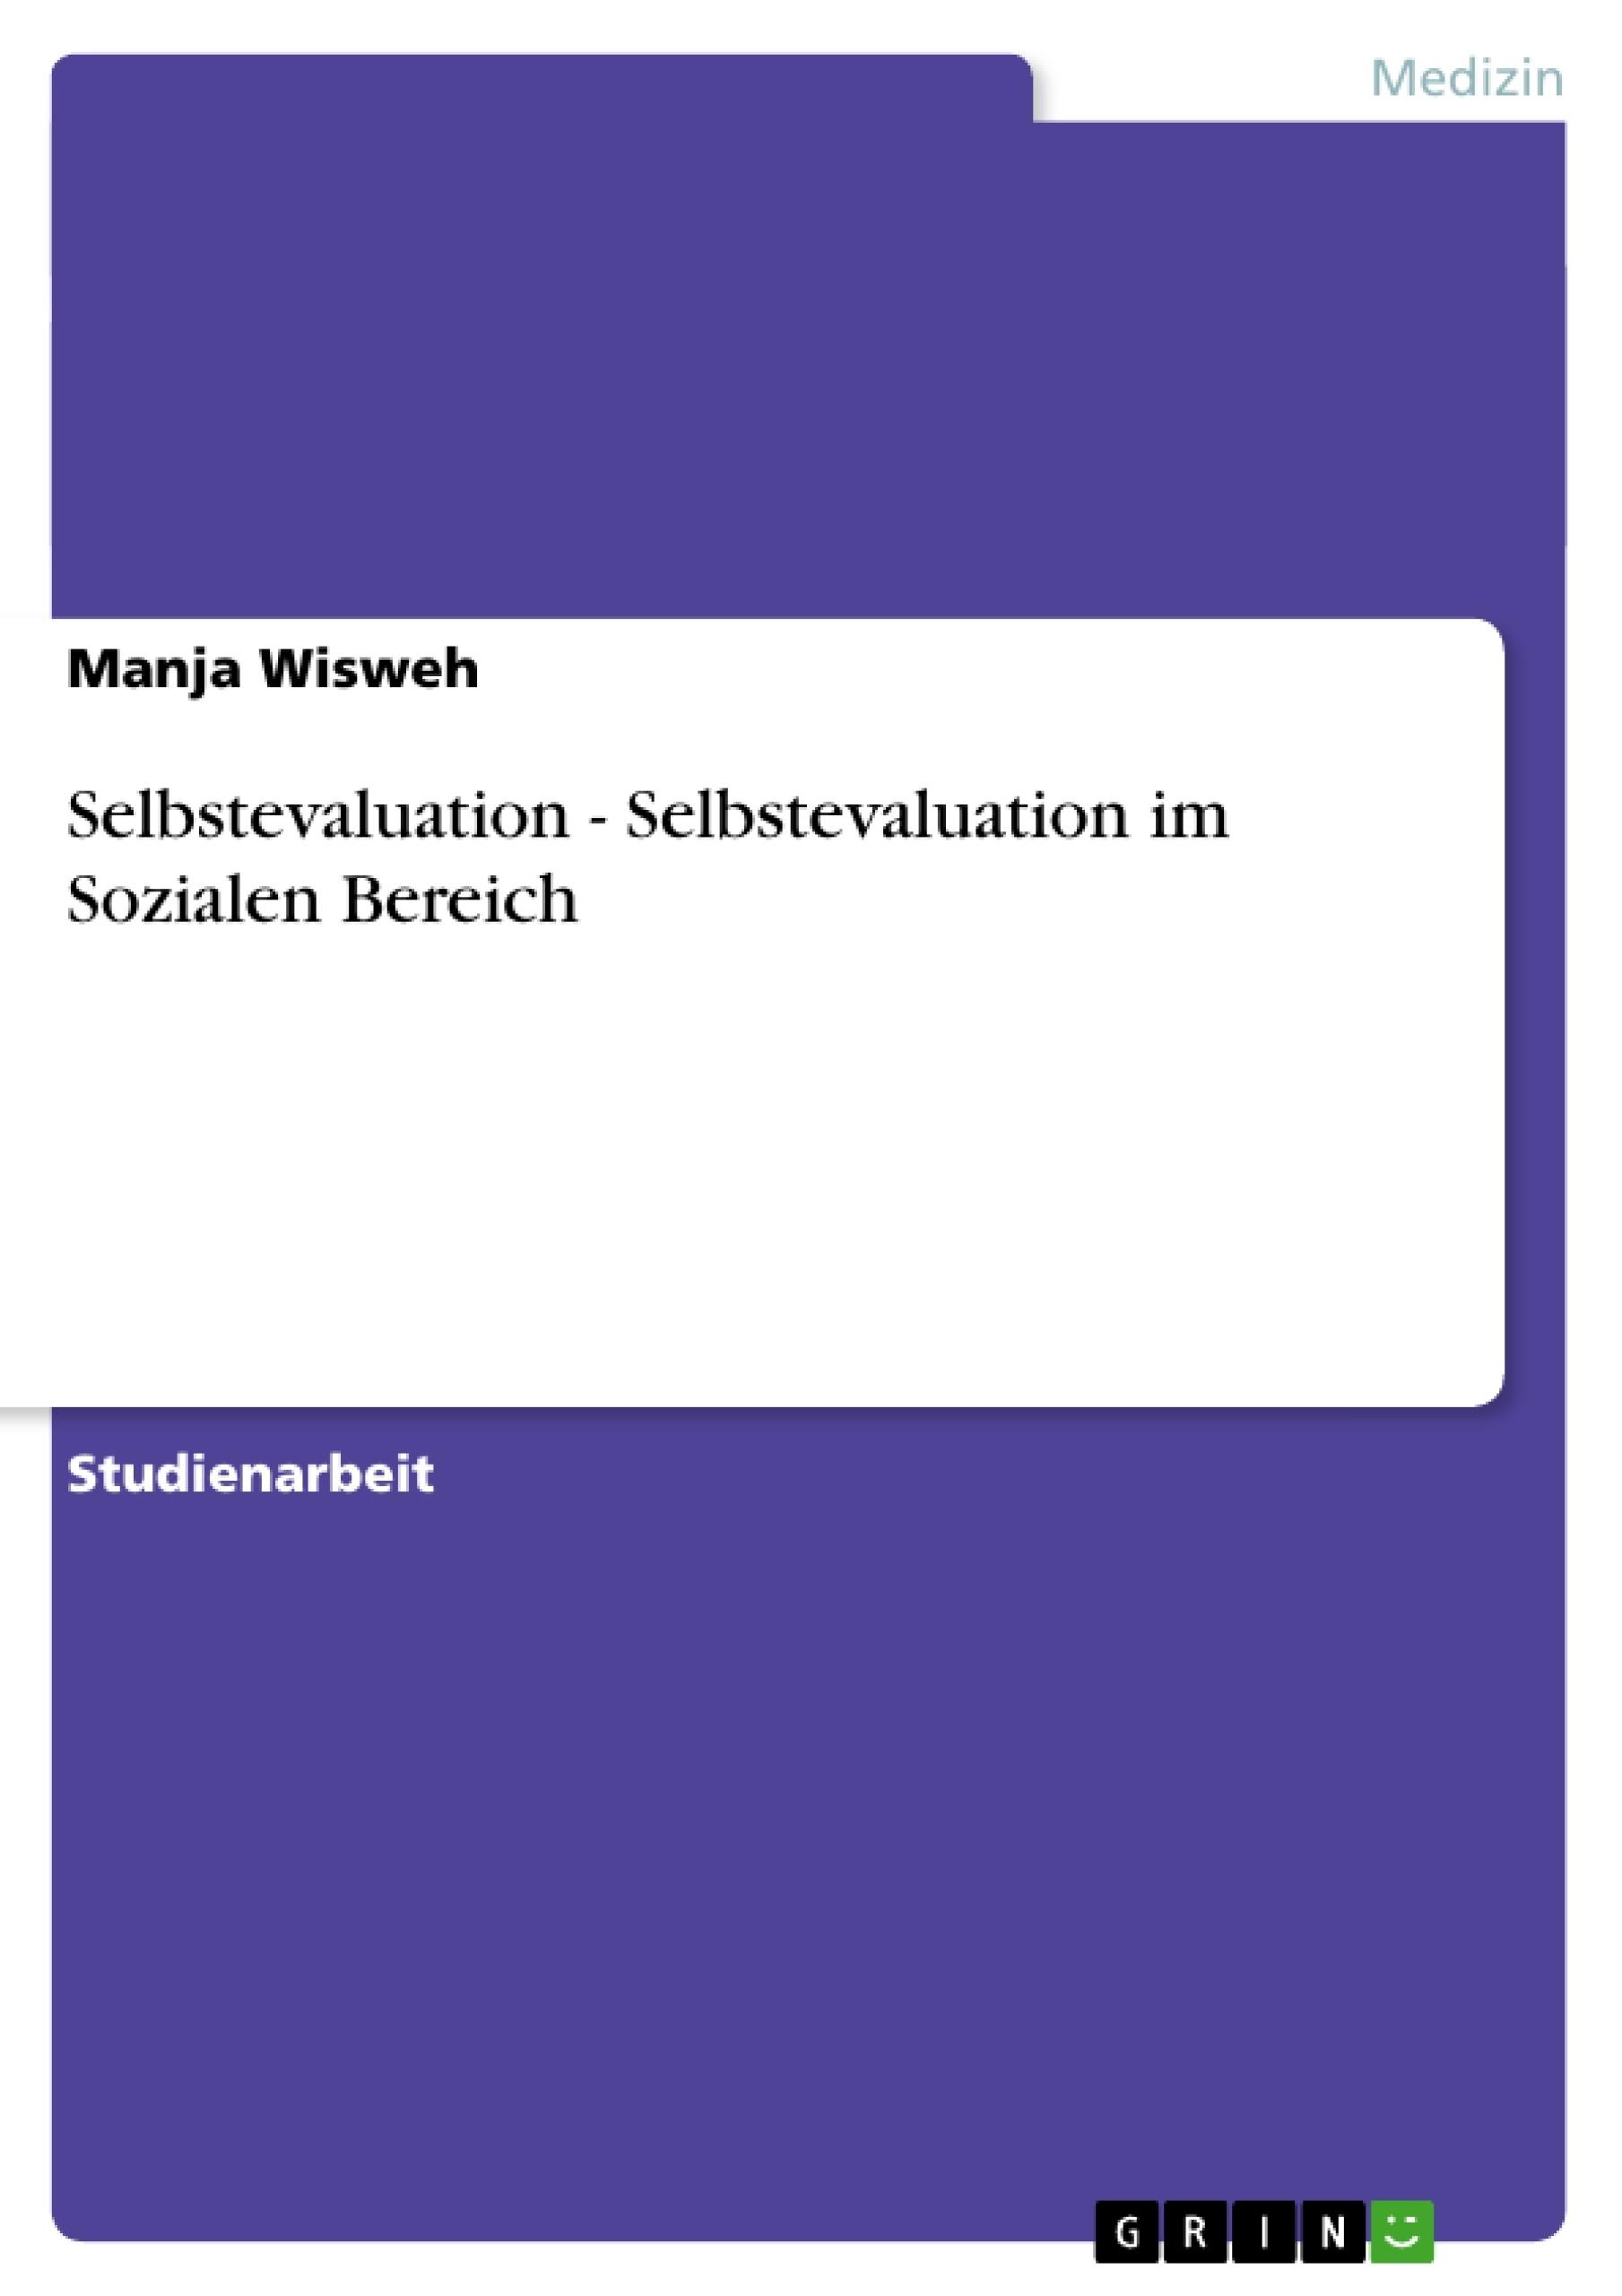 Titel: Selbstevaluation - Selbstevaluation im Sozialen Bereich